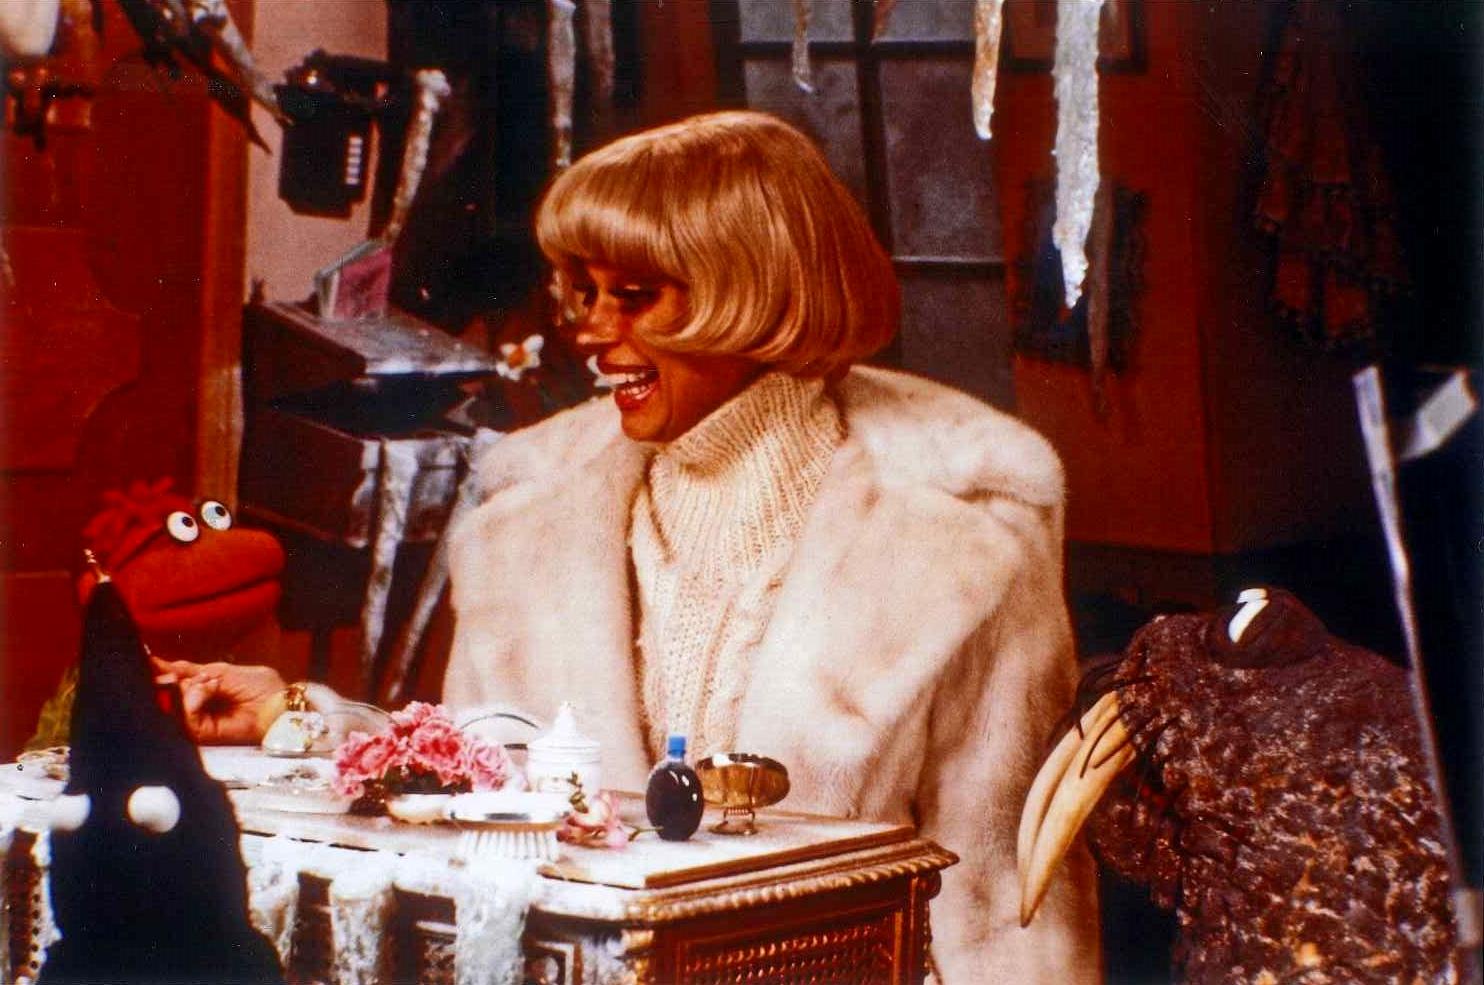 Episode 423: Carol Channing